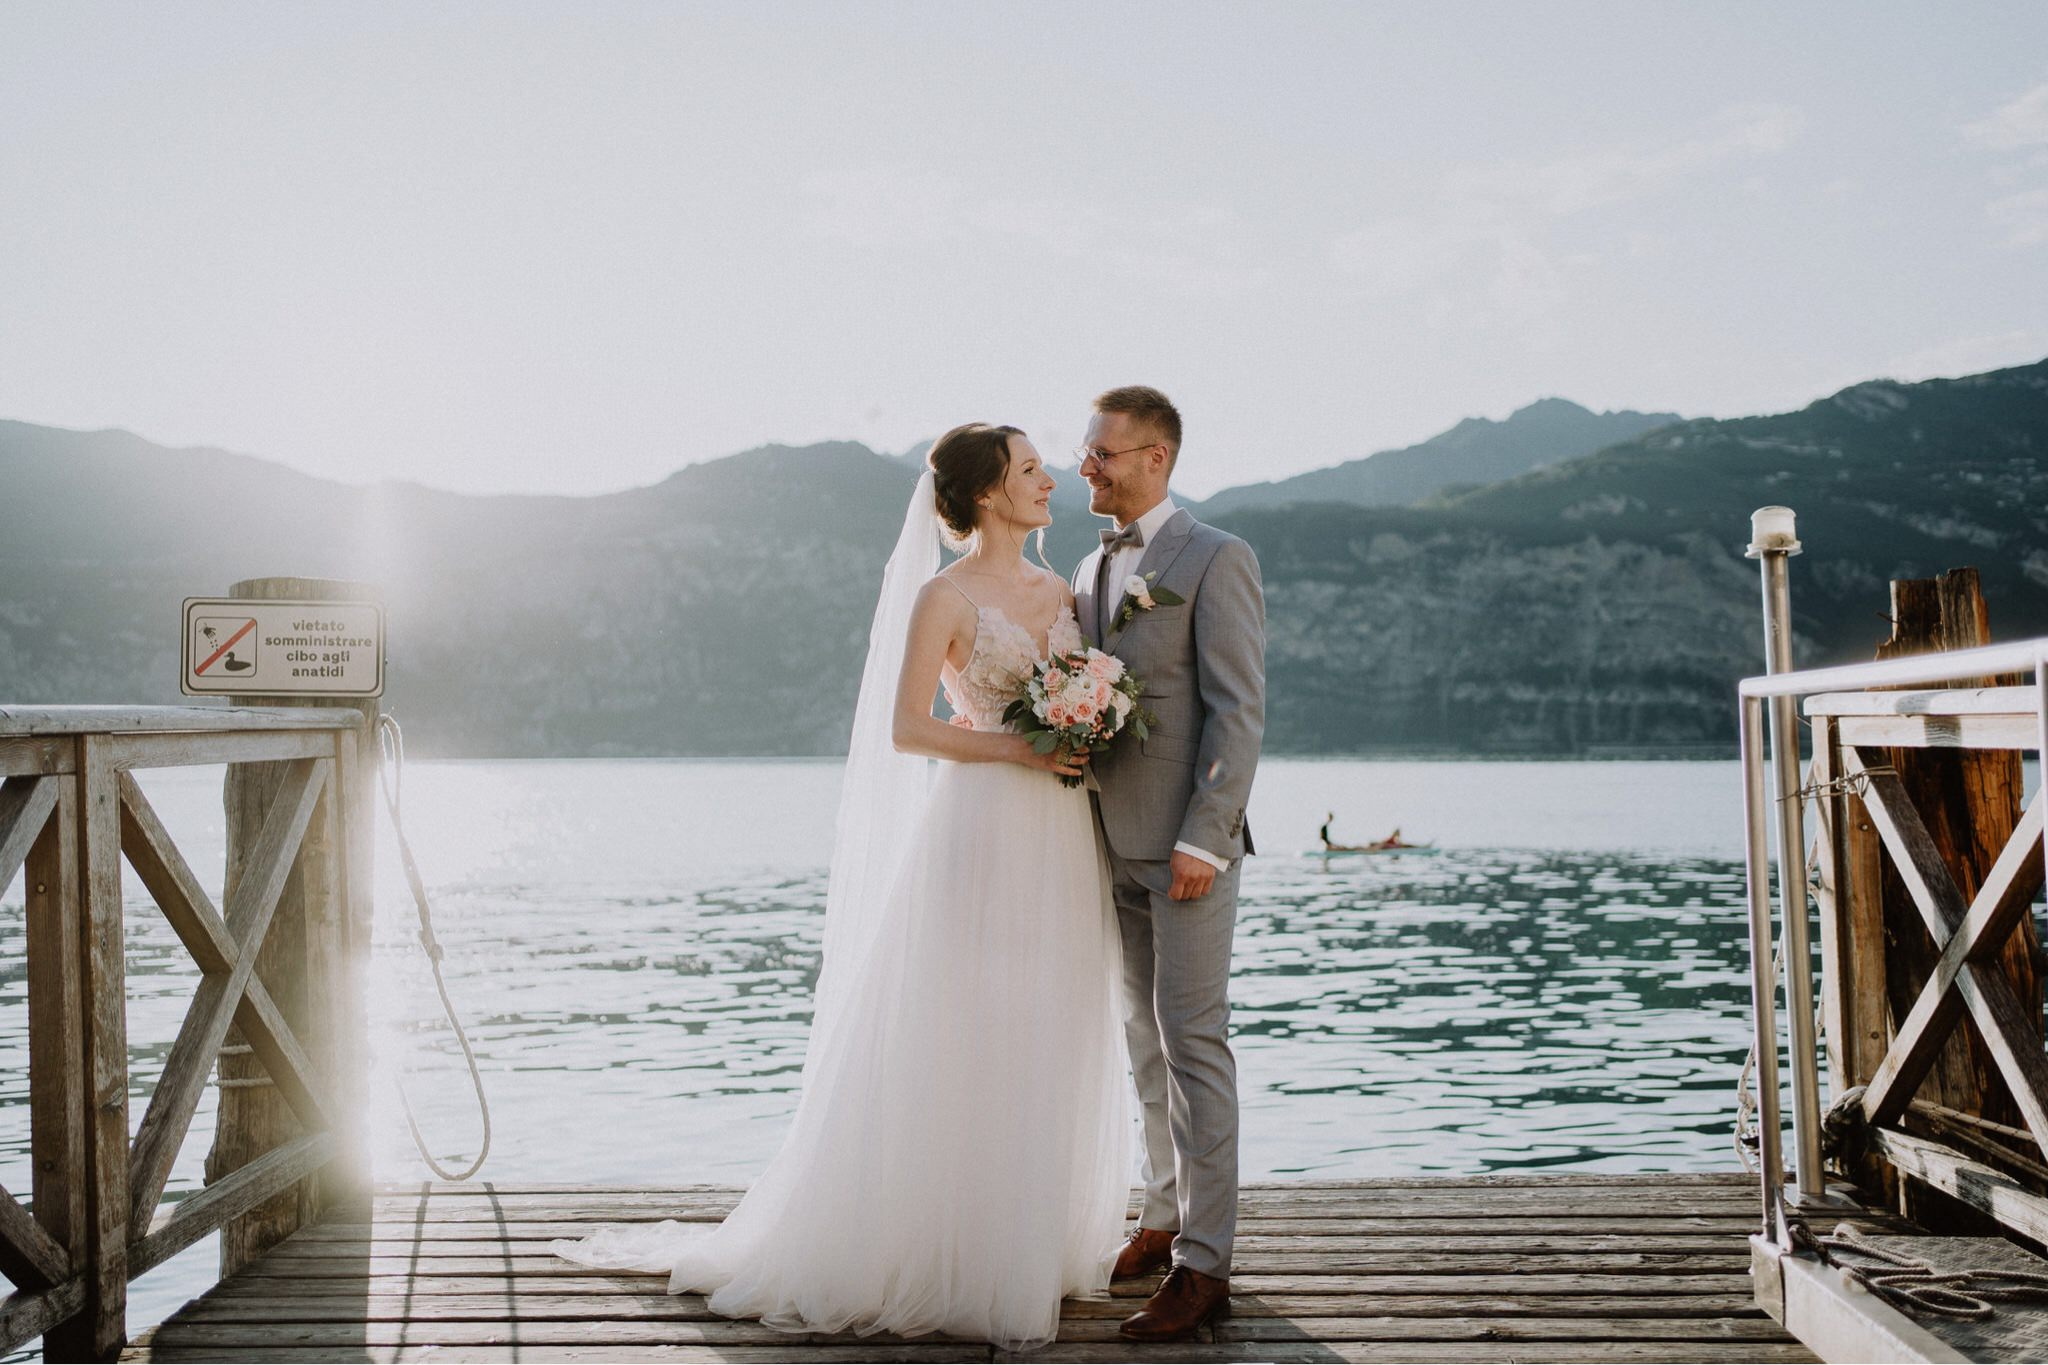 54 la 03 zeremonie 1334 weddinphotographer Hochzeitsfotograf newzealand hamilton Weddingphotography Stuttgart